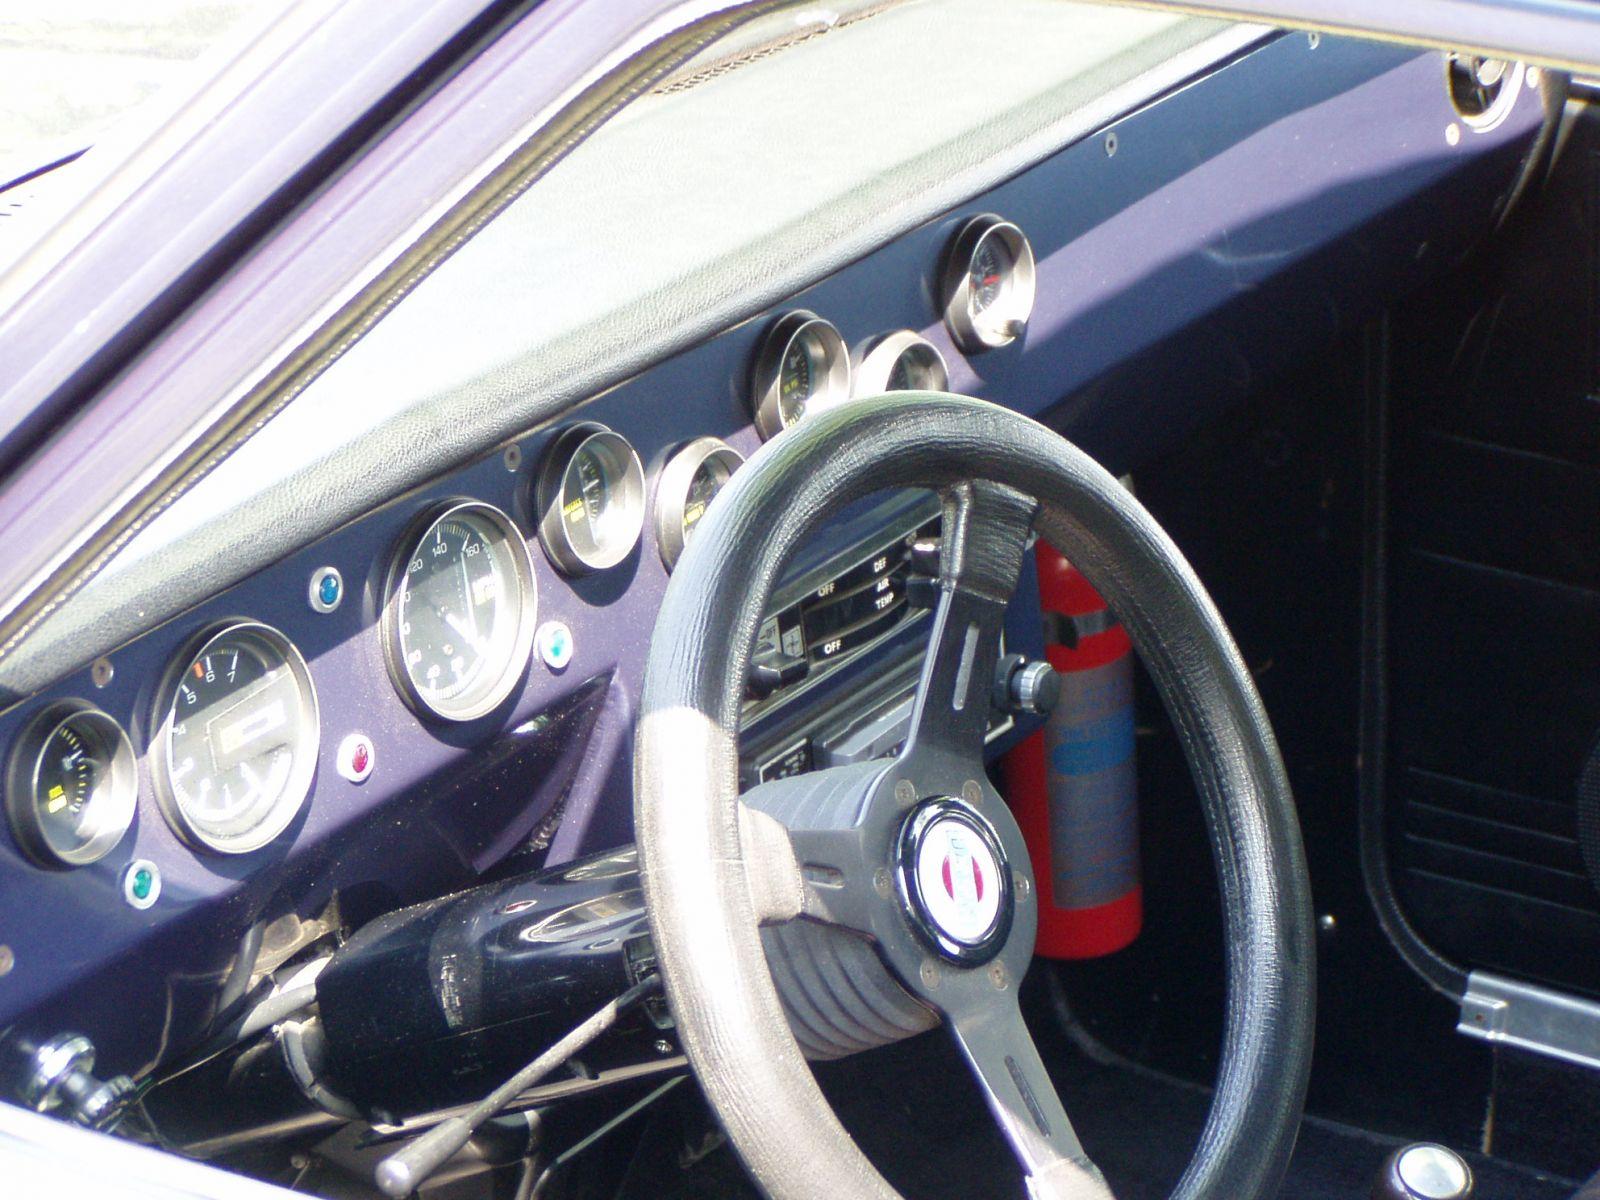 Nestor's custom dash and gauges